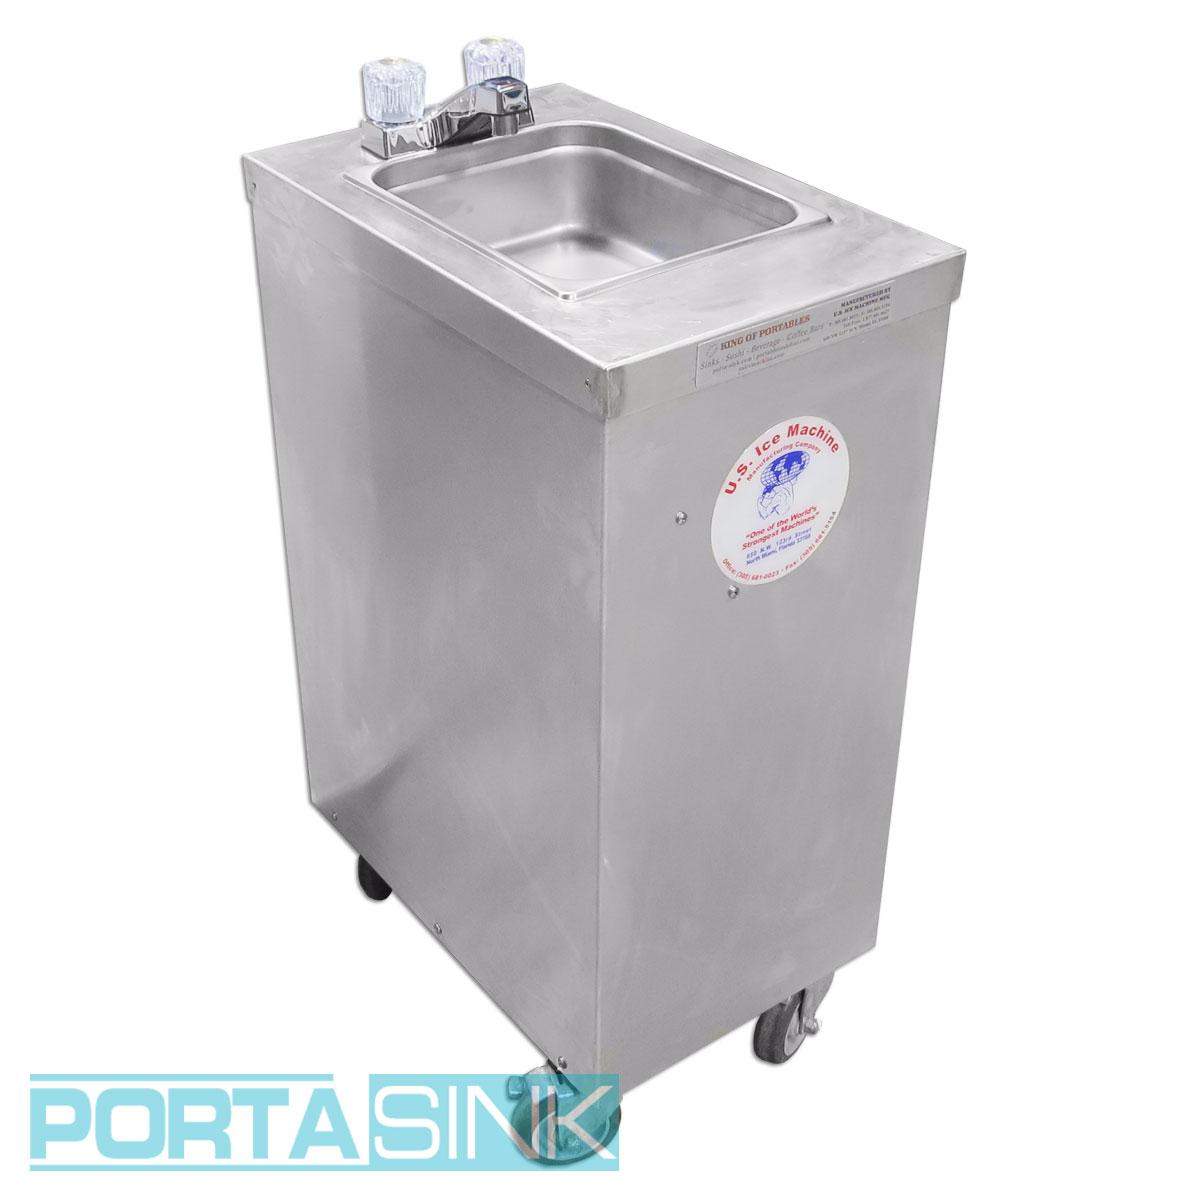 Portable Mini Aluminum Hand Sink U2013 Portable Sink U2013 Portable Sinks U0026  Portable Bars